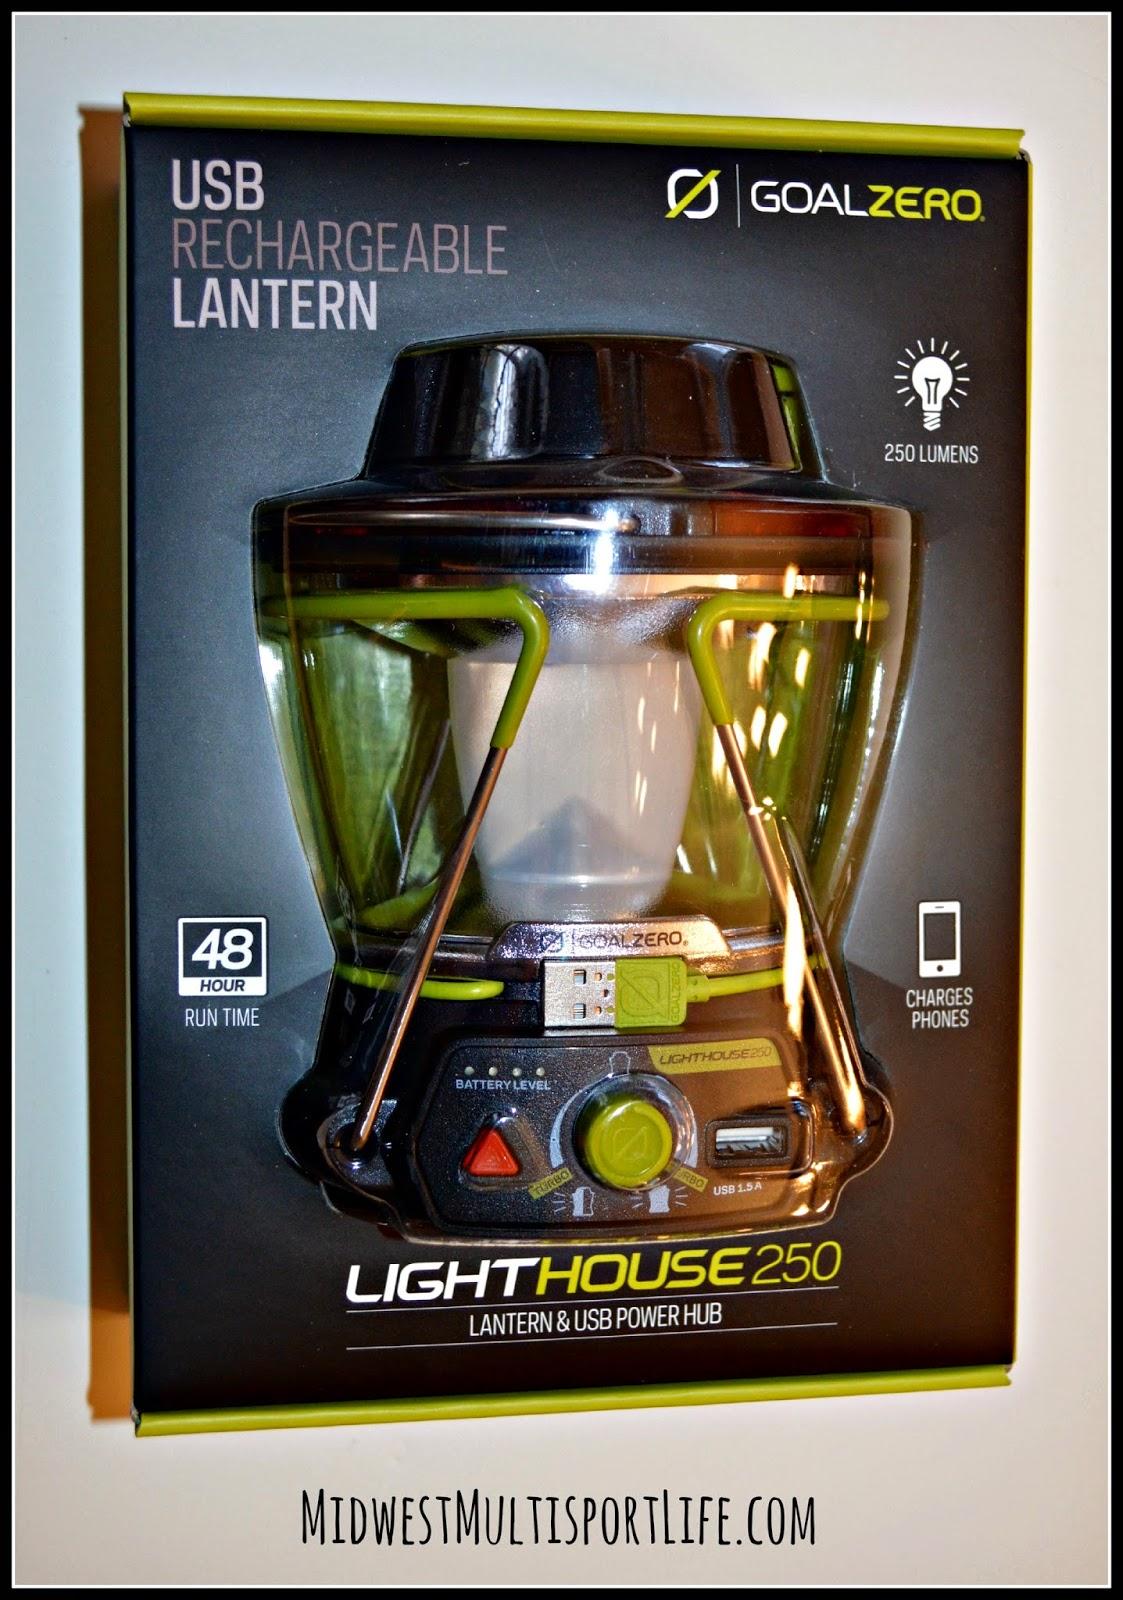 GoalZero USB Rechargeable Lantern